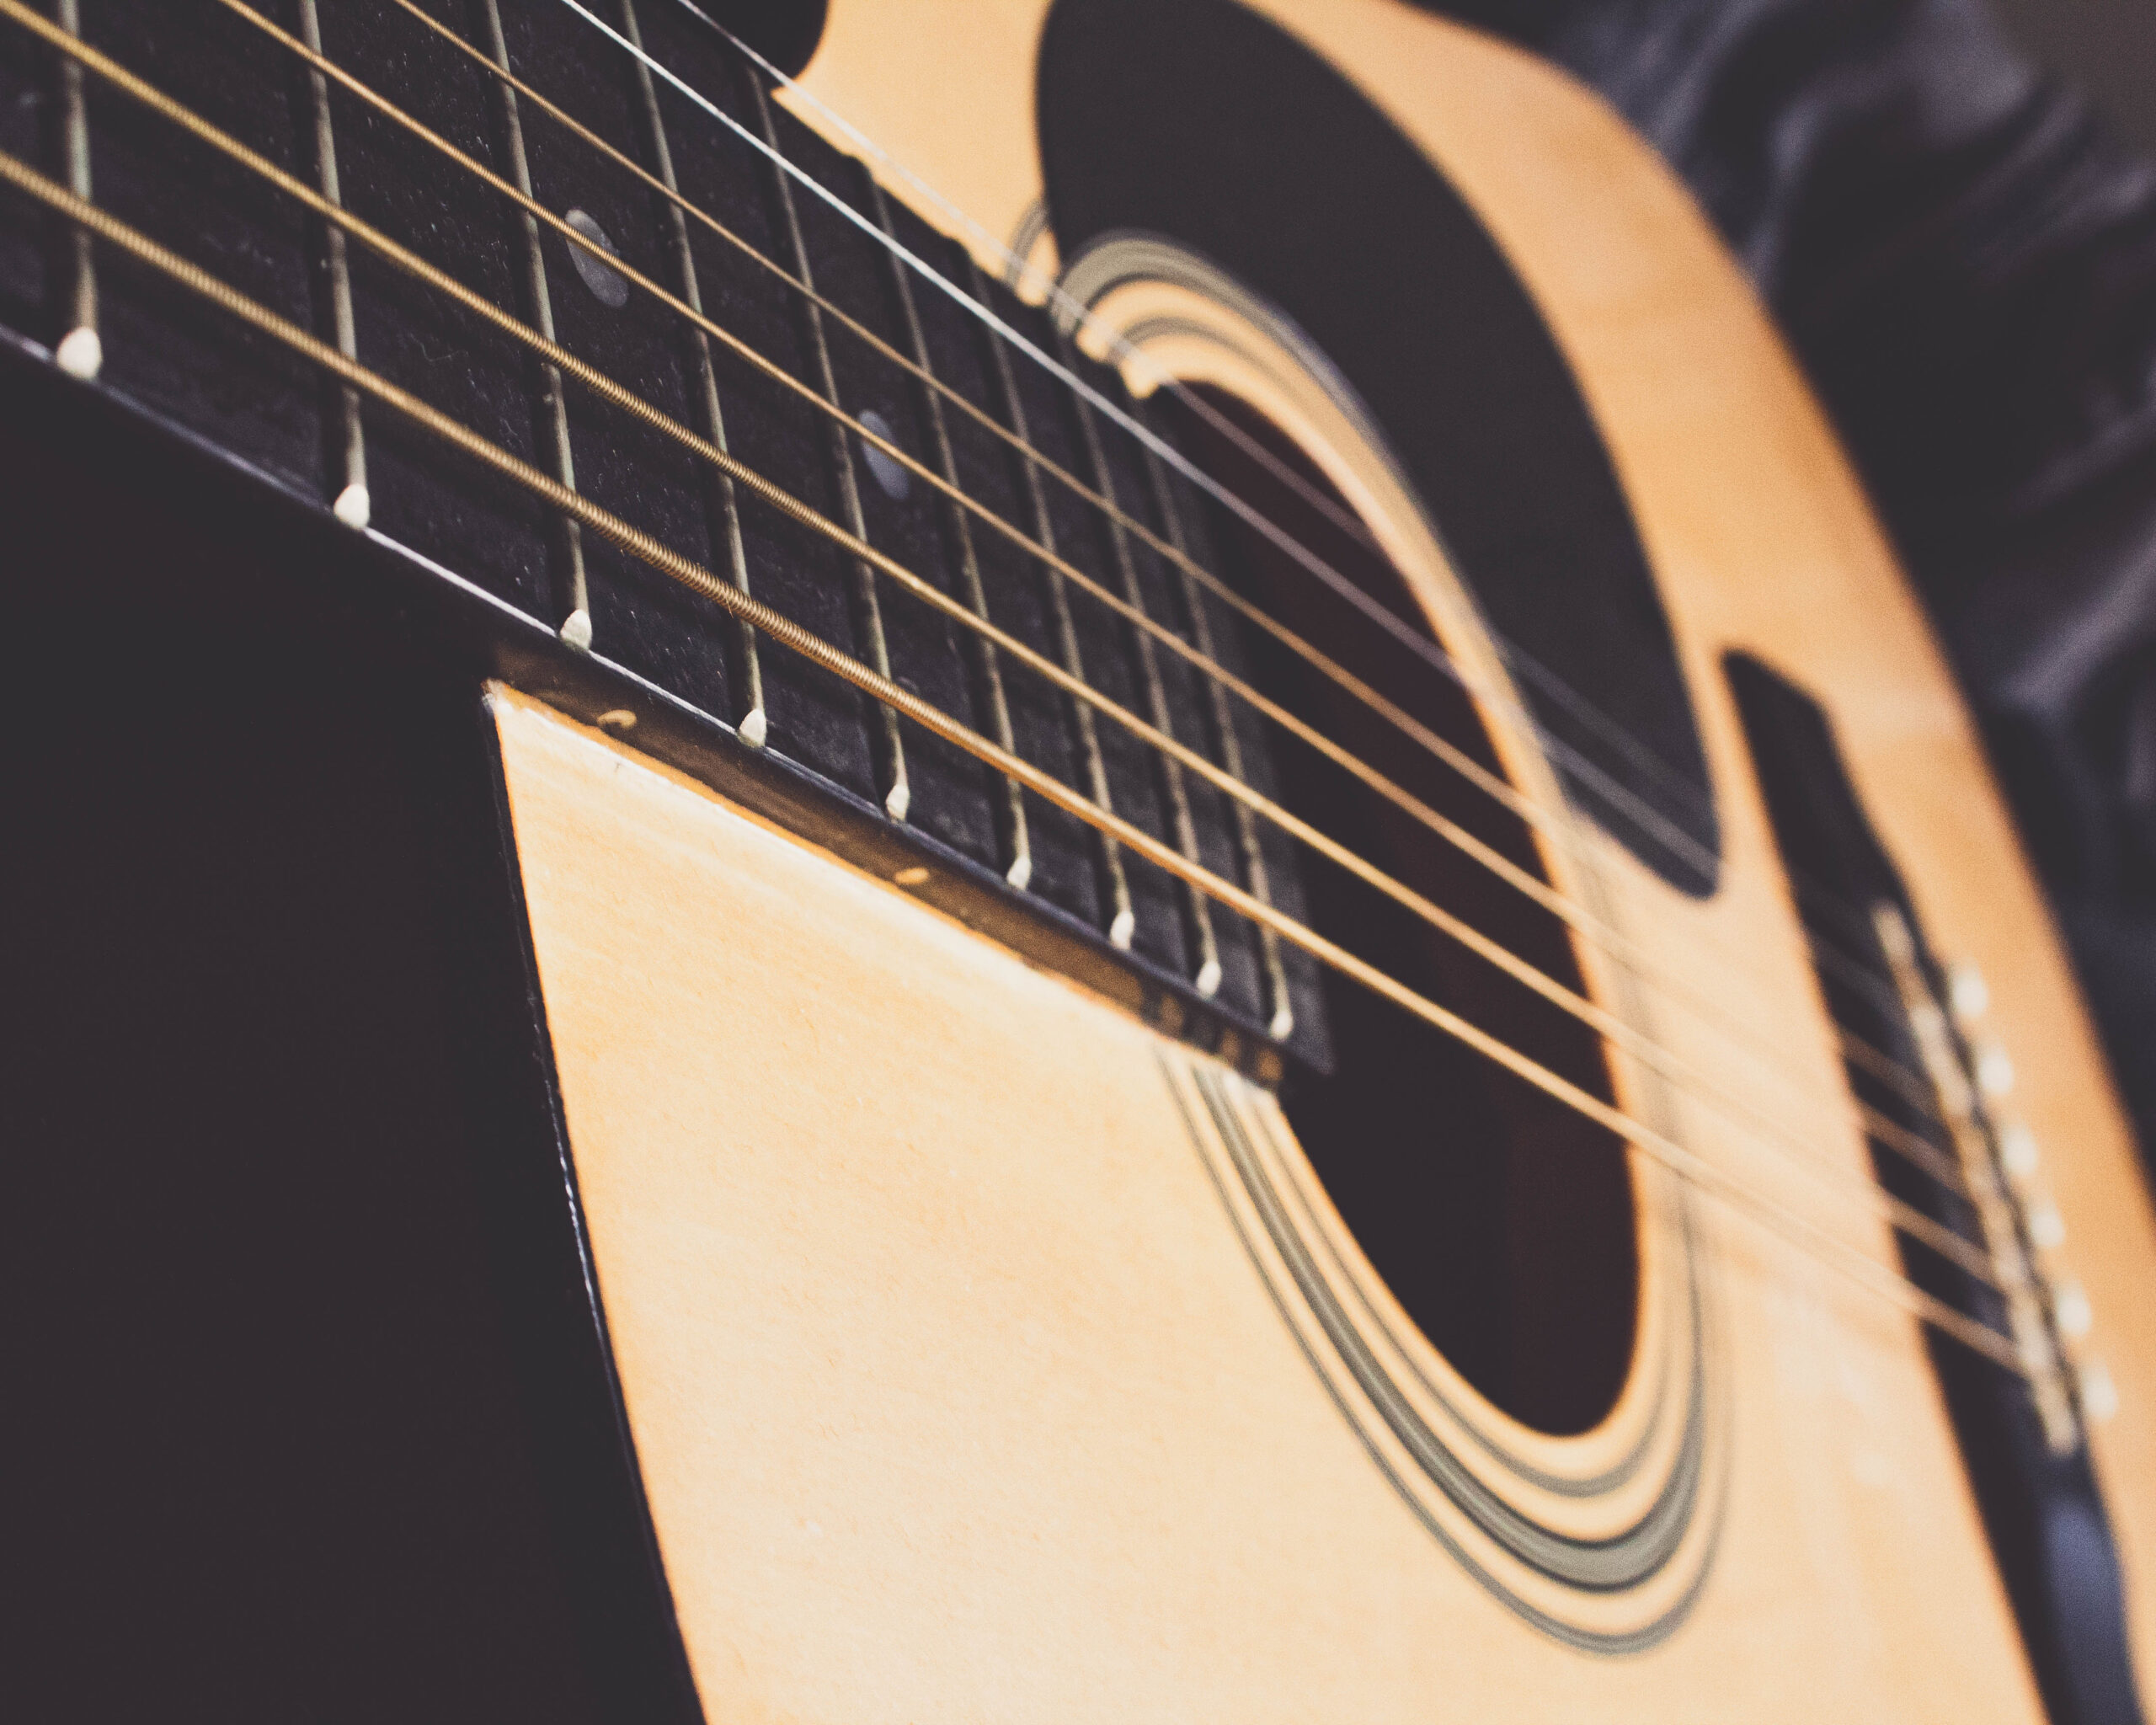 24-9-2020-Paul-Jackson-Photography-Acoustic-Guitar